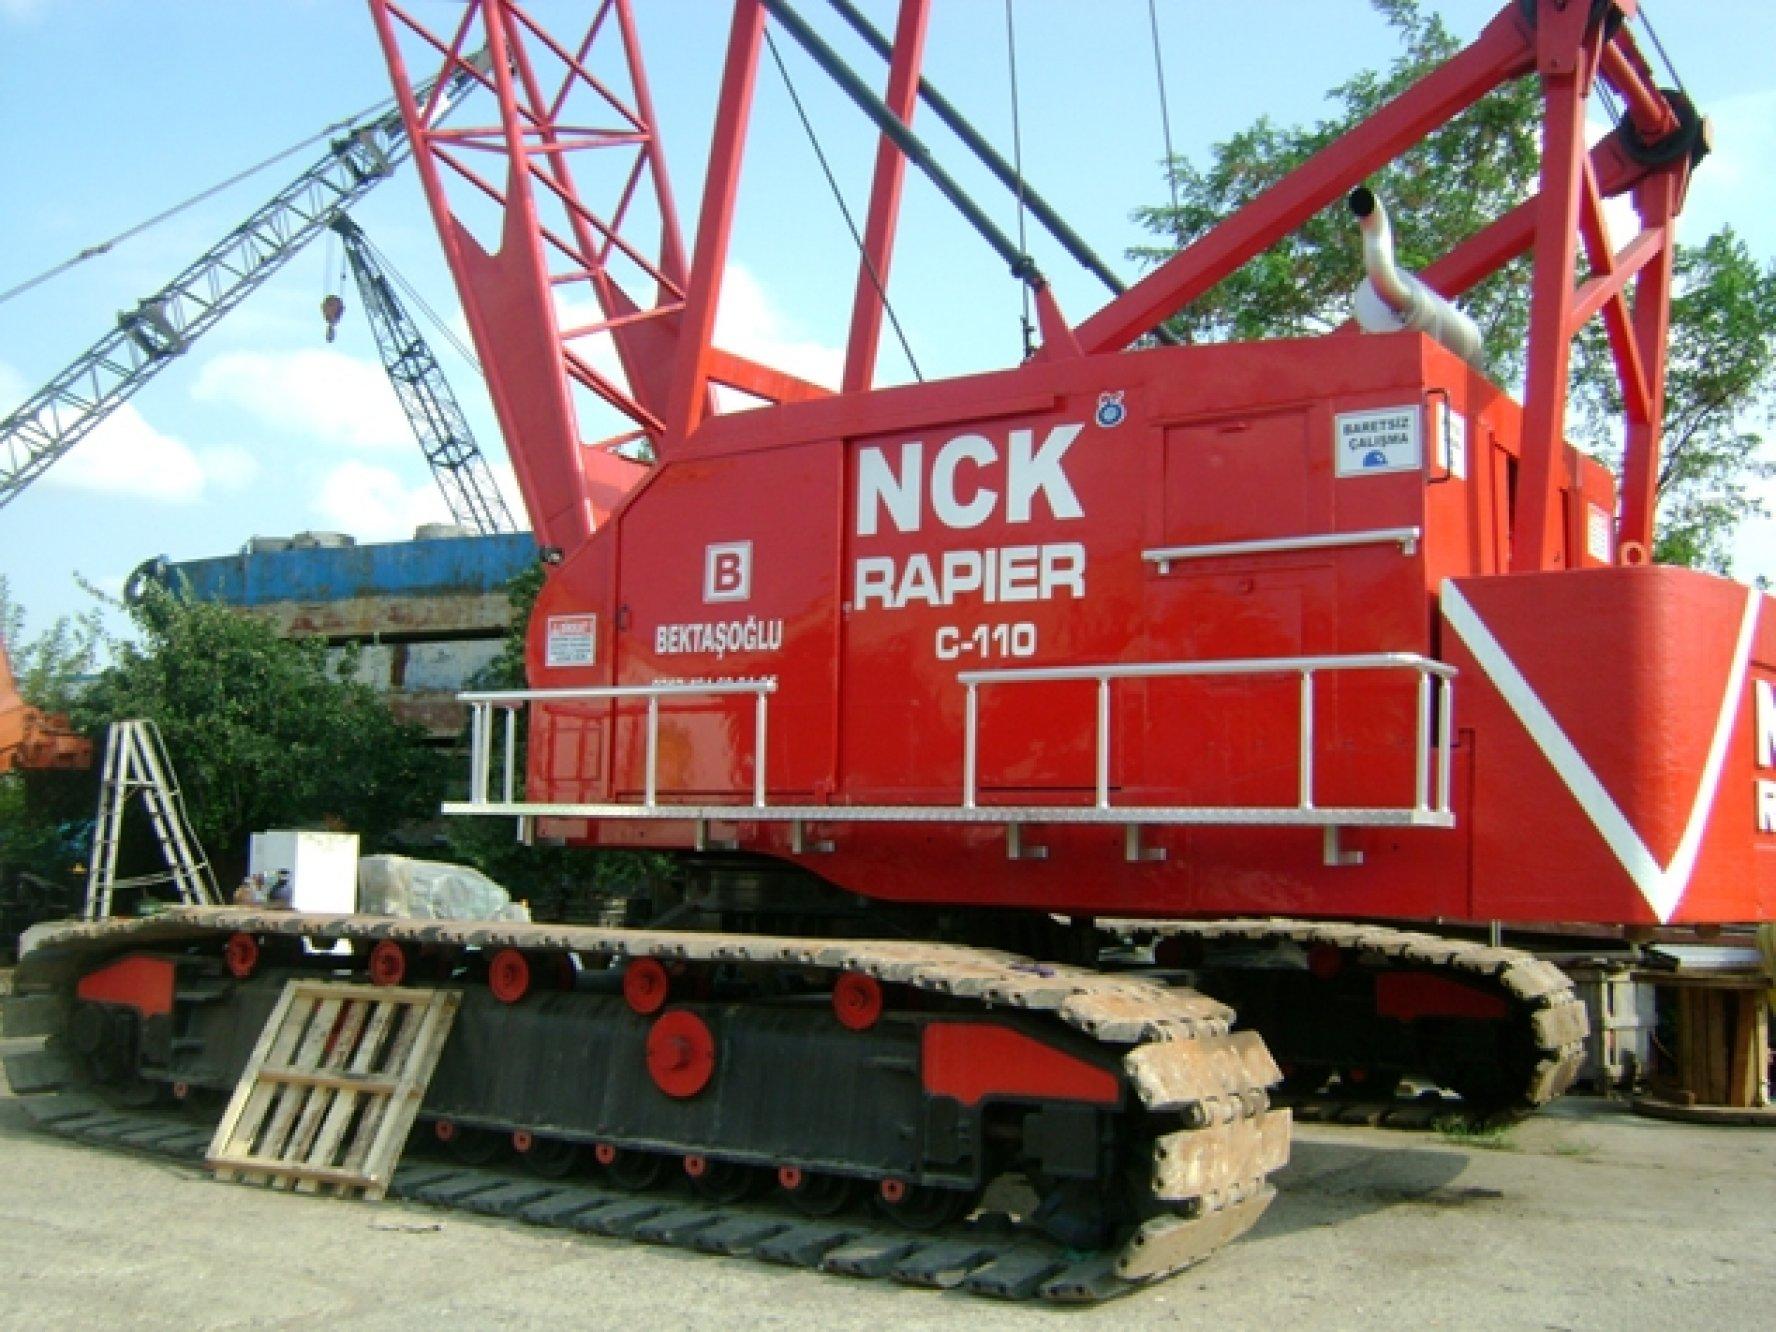 NCK RAPIER C110